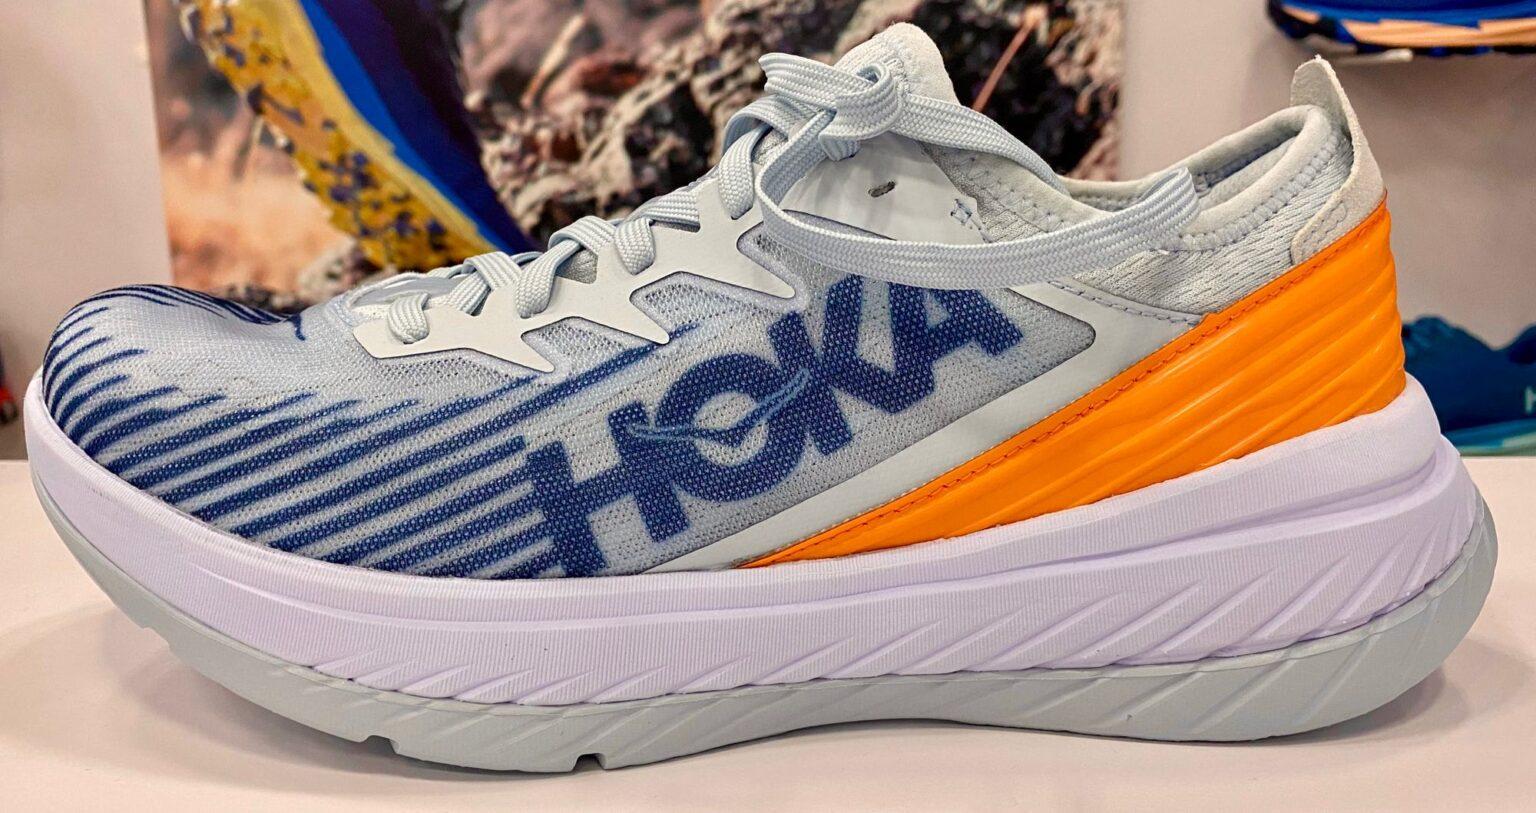 Hoka One One Carbon X-SPE